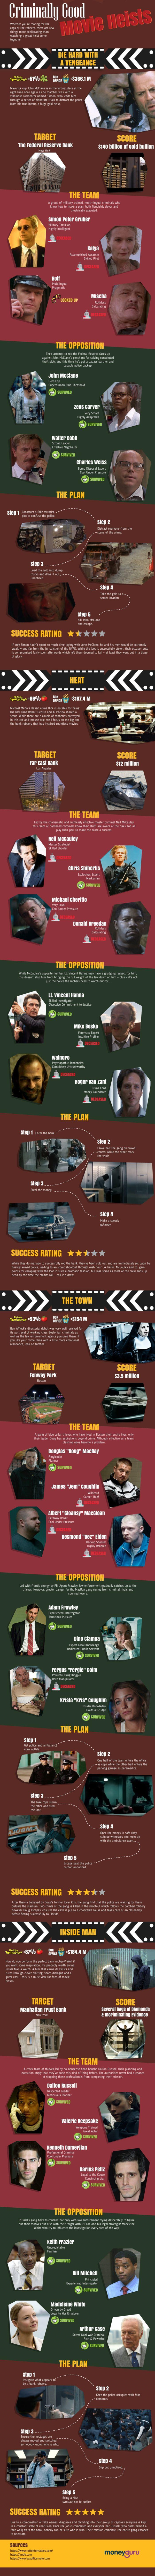 Movie Heist Infographic